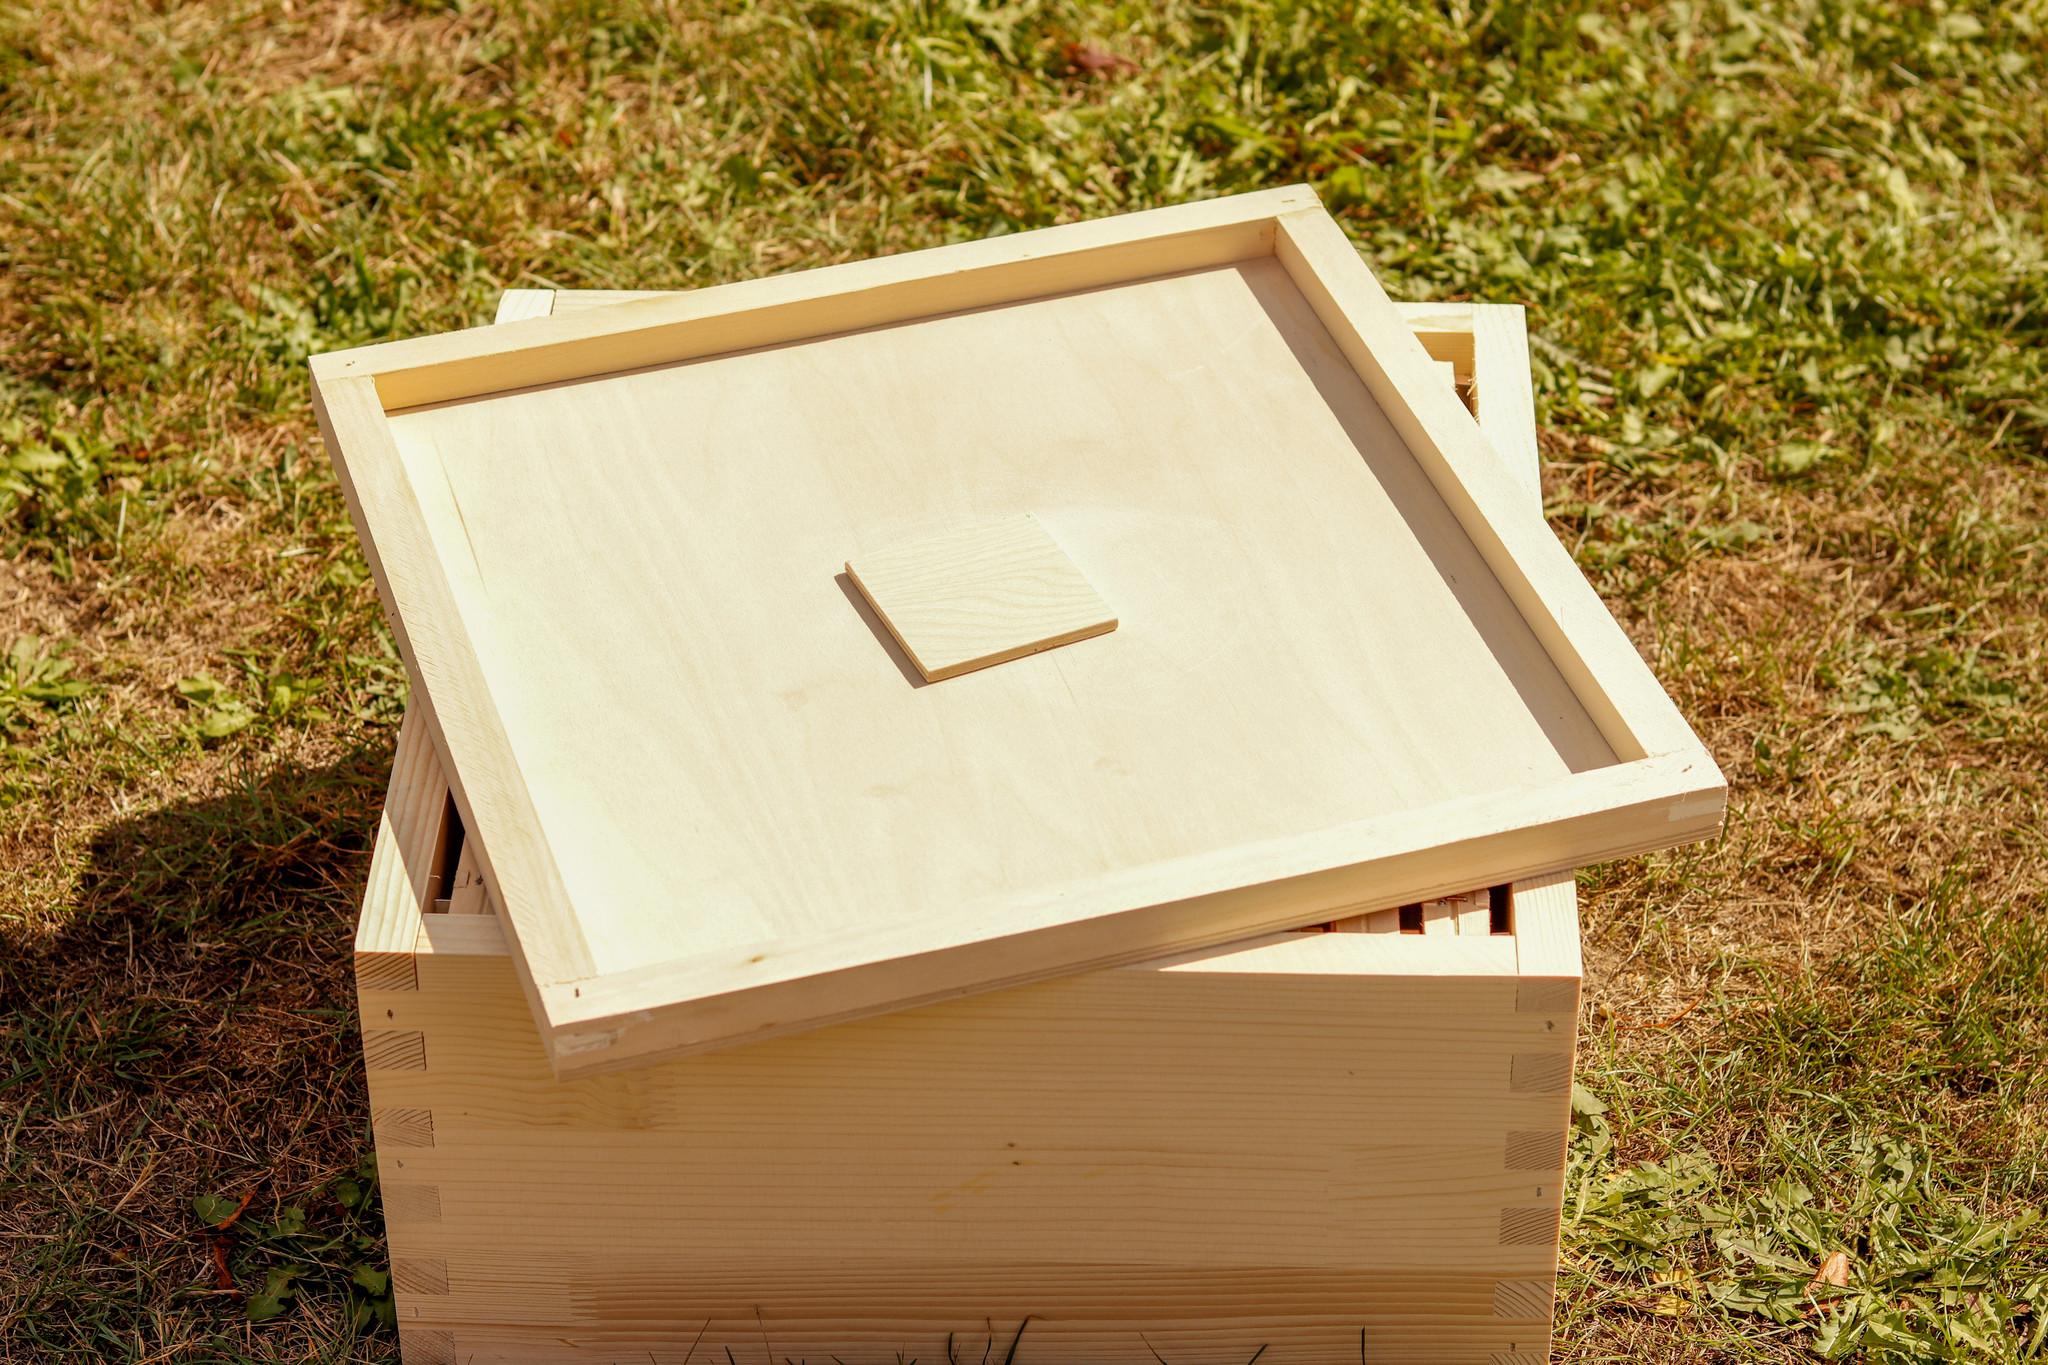 Houten afdekplaat met voedergat Simplex afleggerkast-1